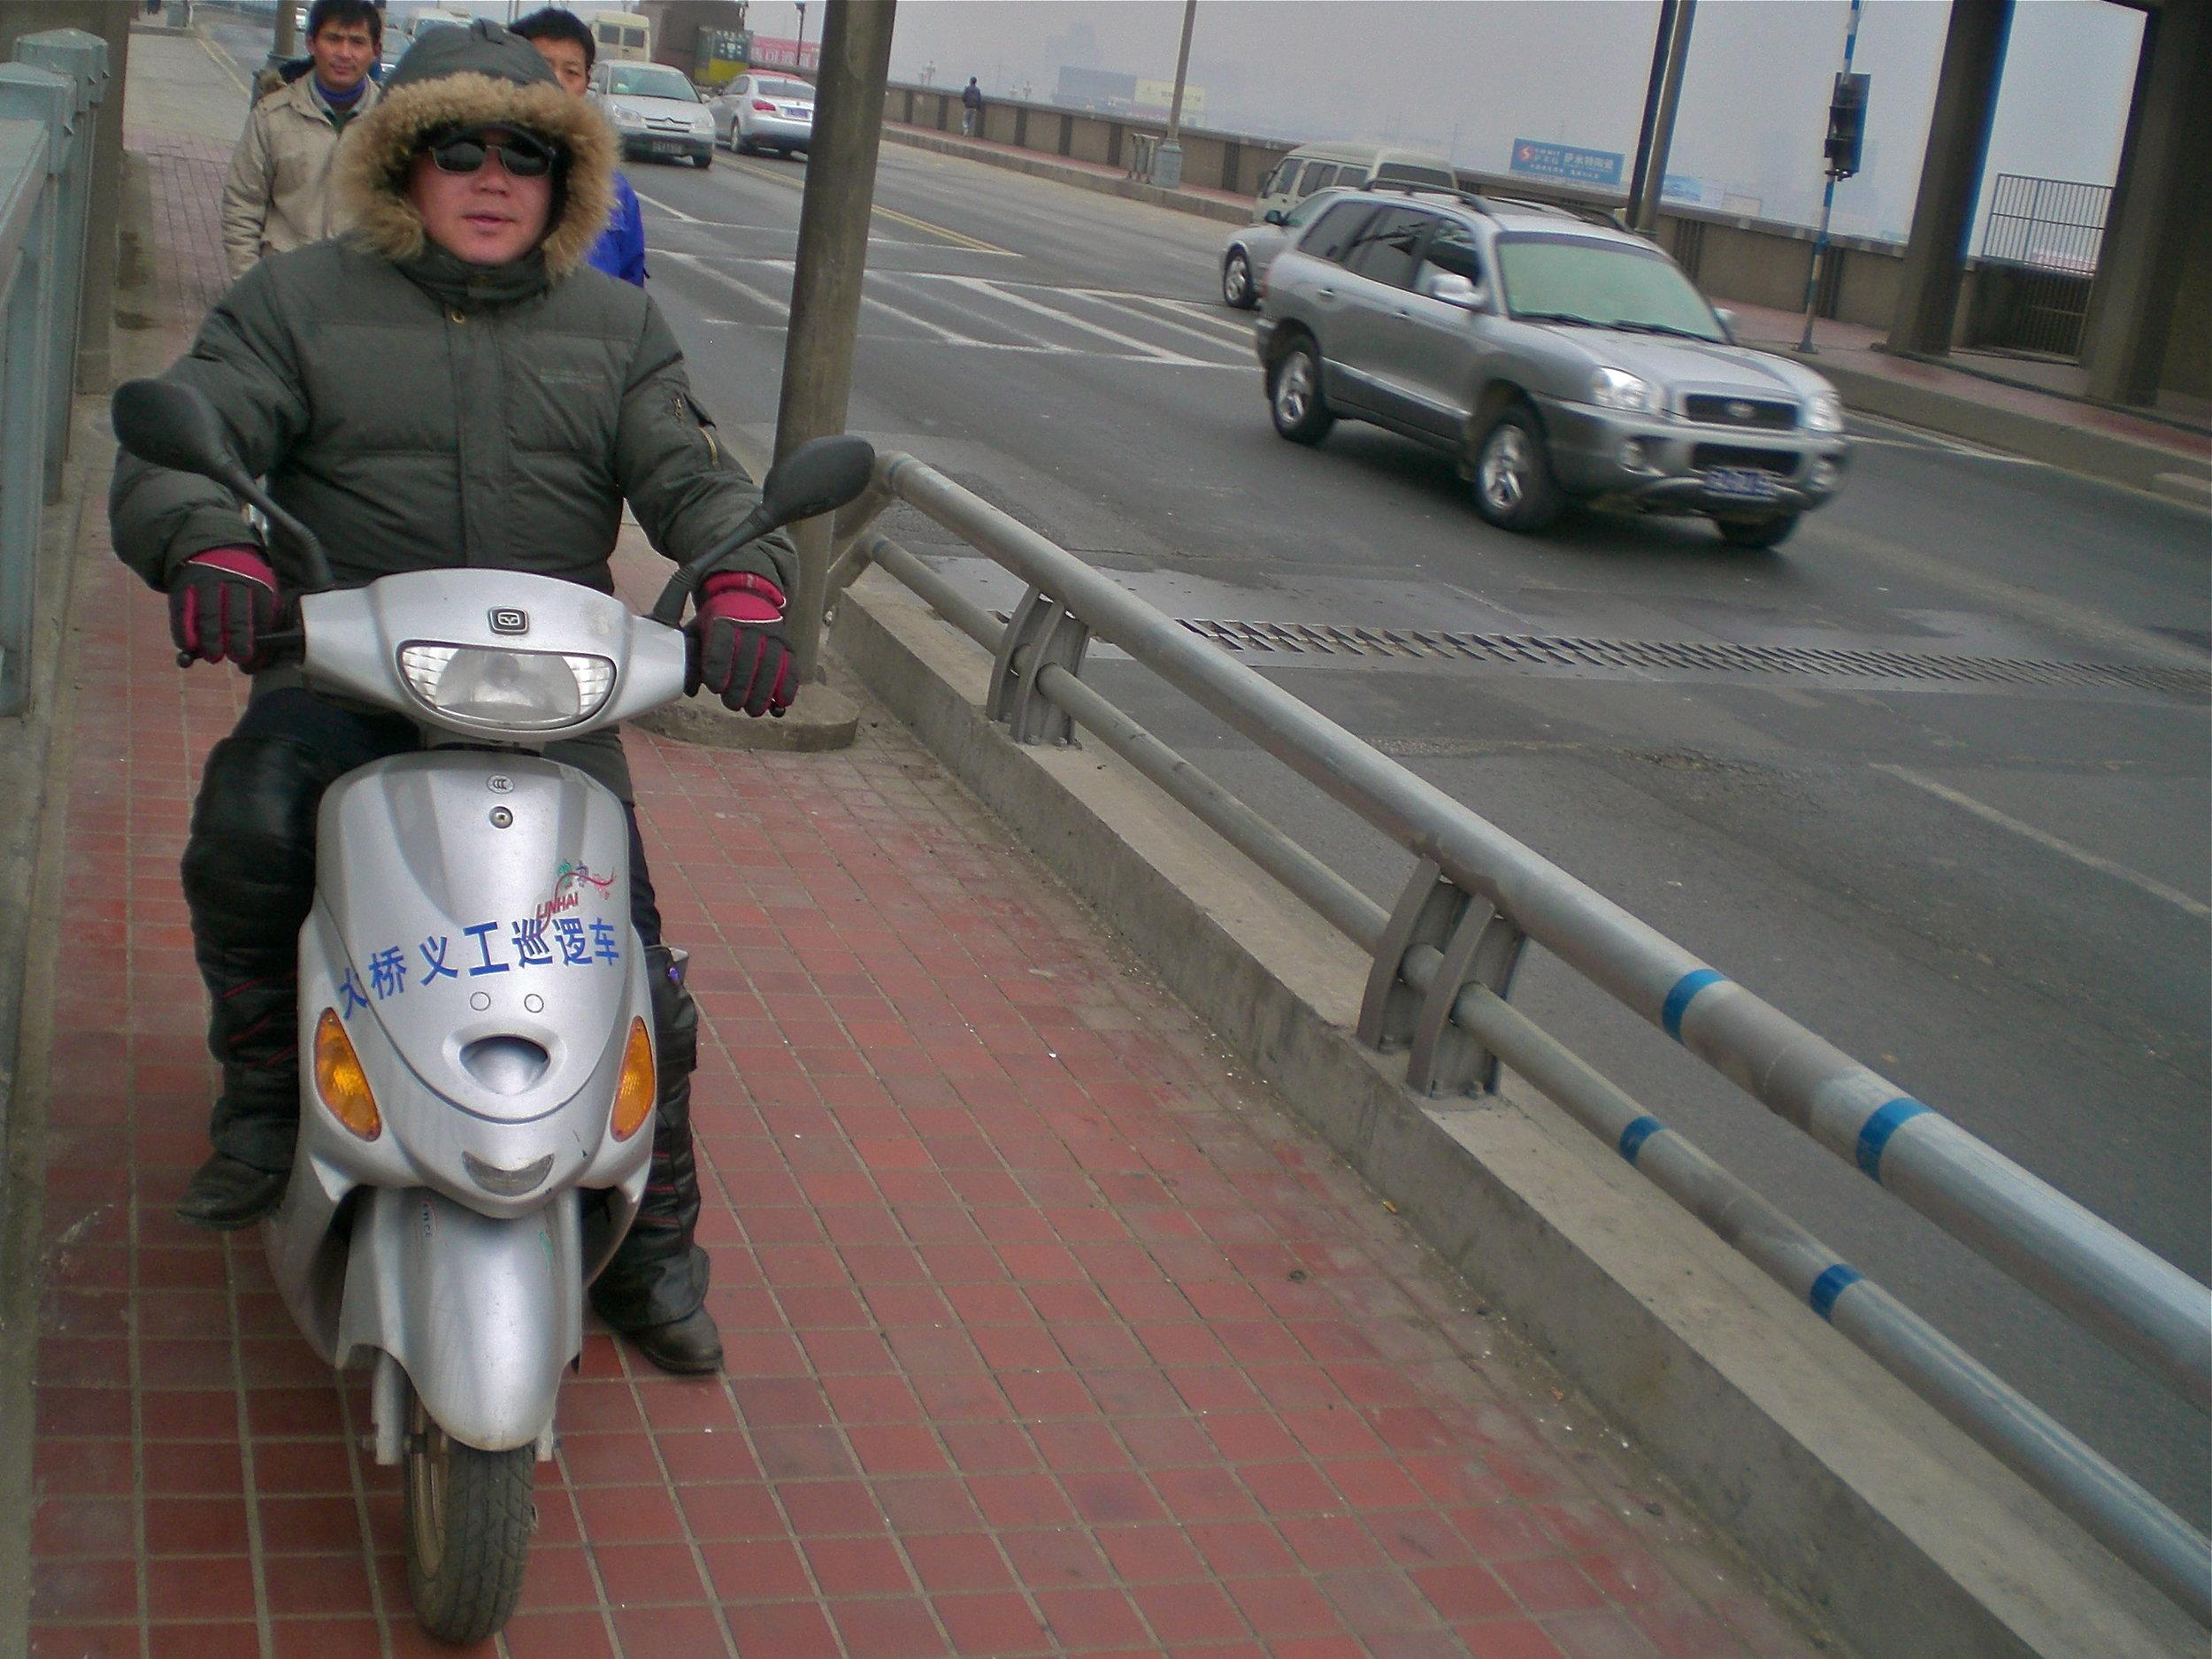 On suicide patrol: Chen Si on the Yangtze River Bridge in Nanjing, China. (C) Remko Tanis